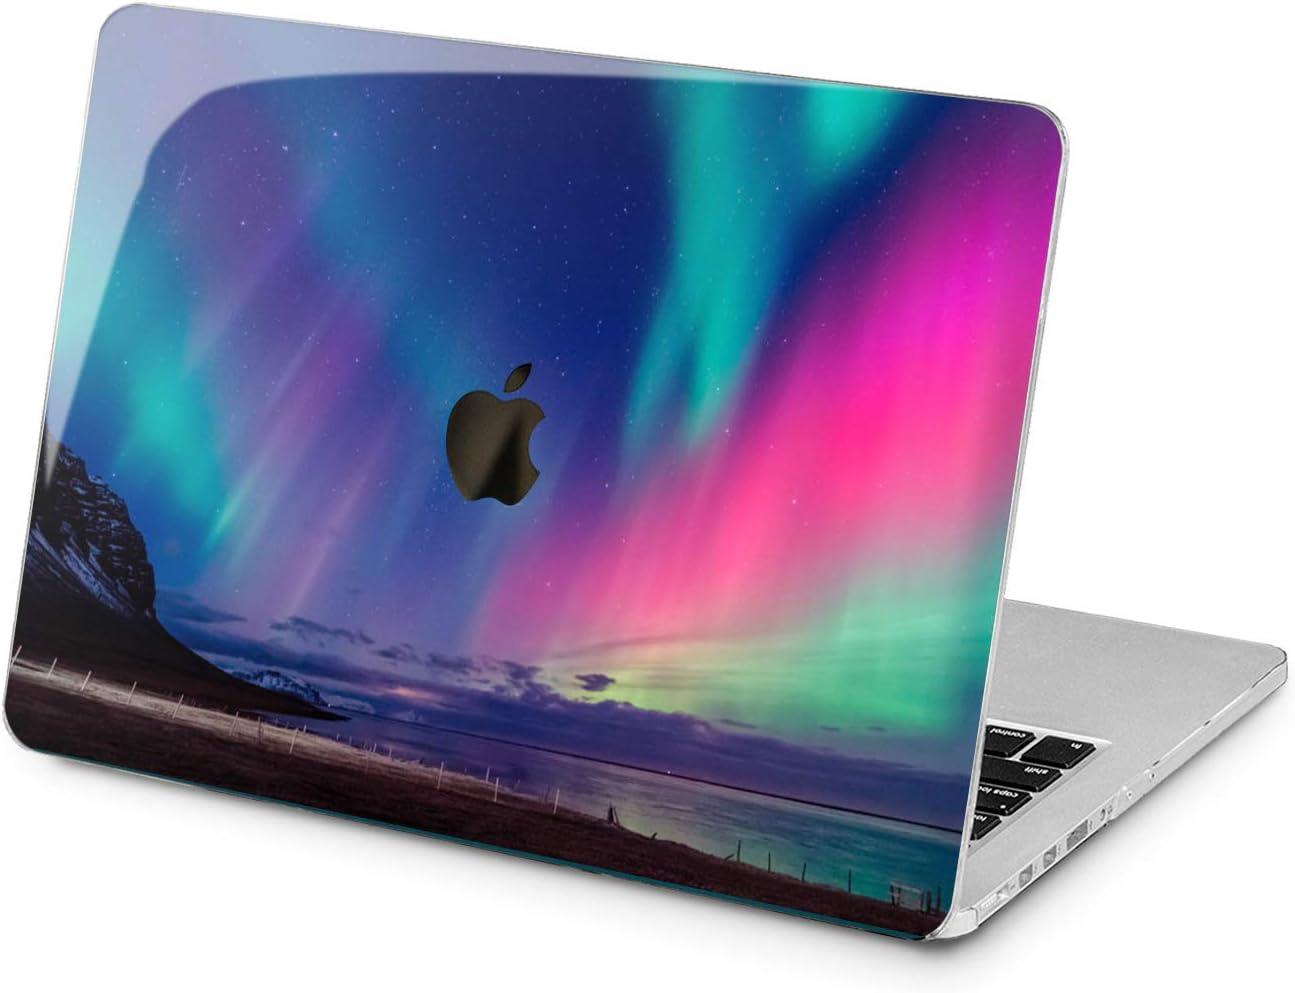 "Cavka Hard Shell Case for Apple MacBook Pro 13"" 2019 15"" 2018 Air 13"" 2020 Retina 2015 Mac 11"" Mac 12"" Lights Design Night Protective Aurora Borealis Laptop Print Sky Cover Northern Plastic Natural"